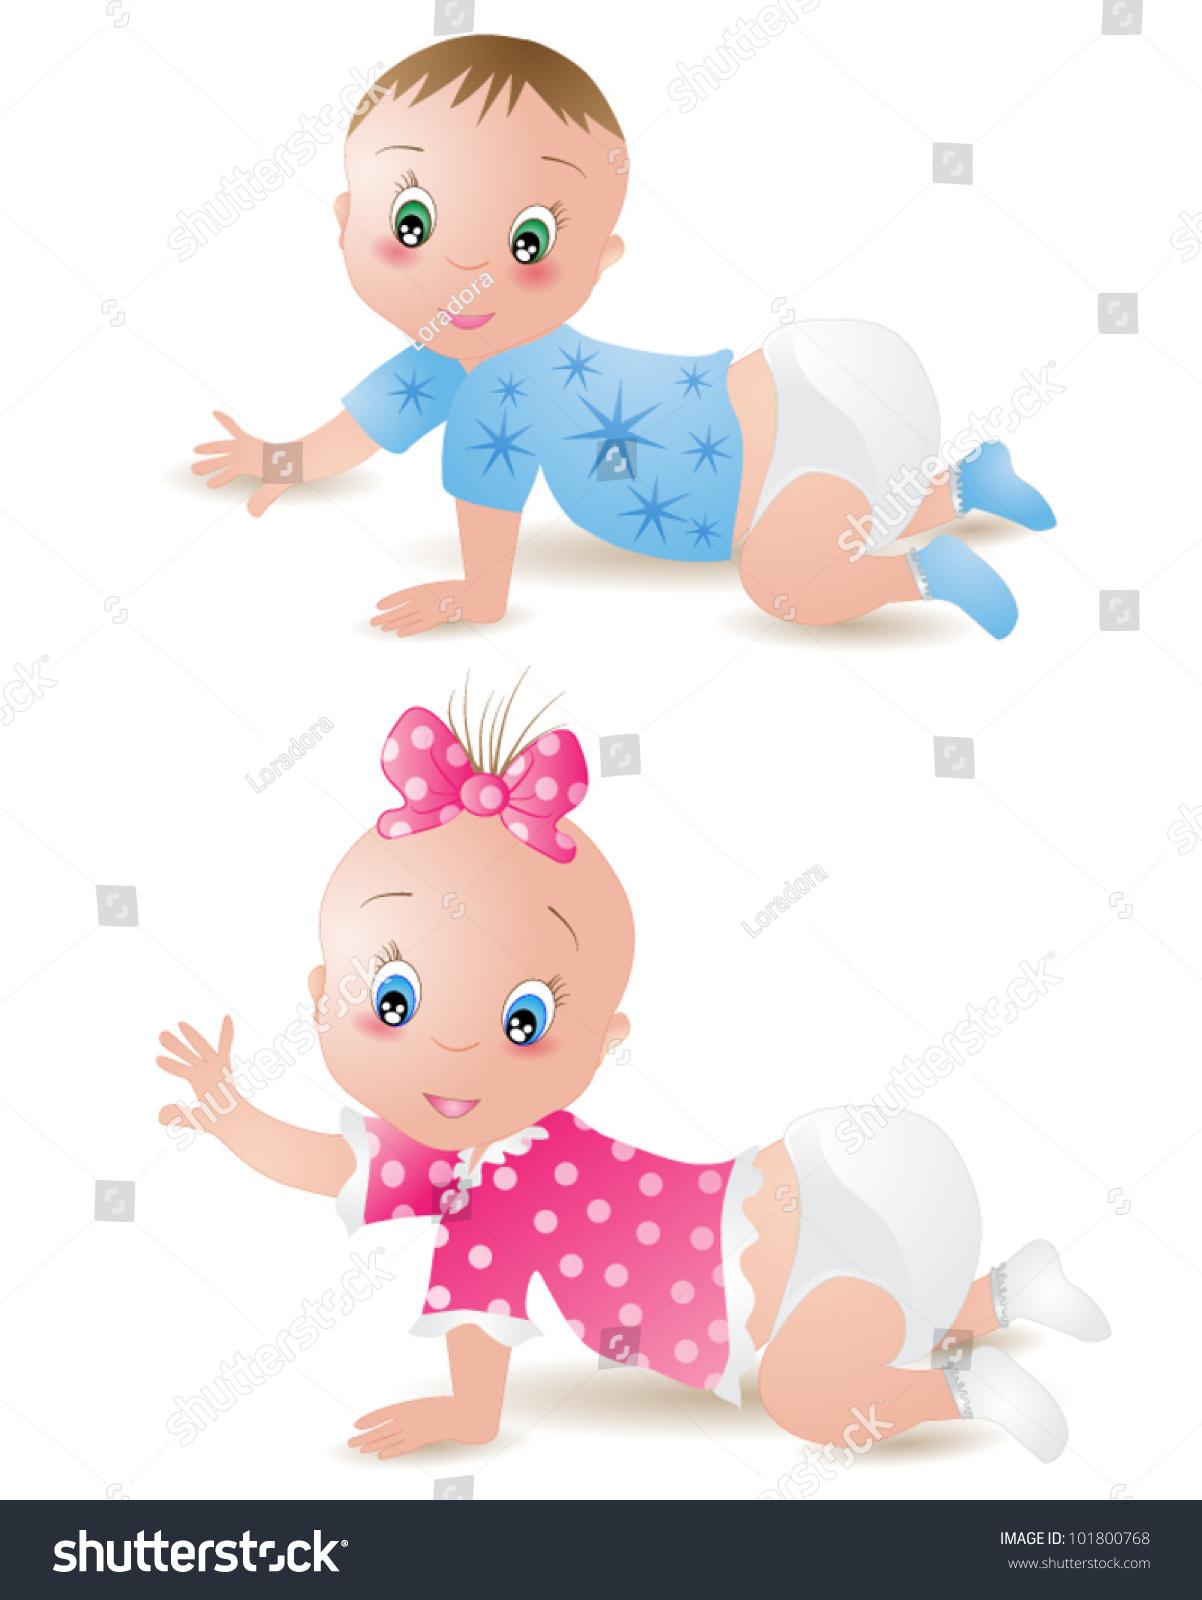 baby girl boy stock vector (royalty free) 101800768 - shutterstock